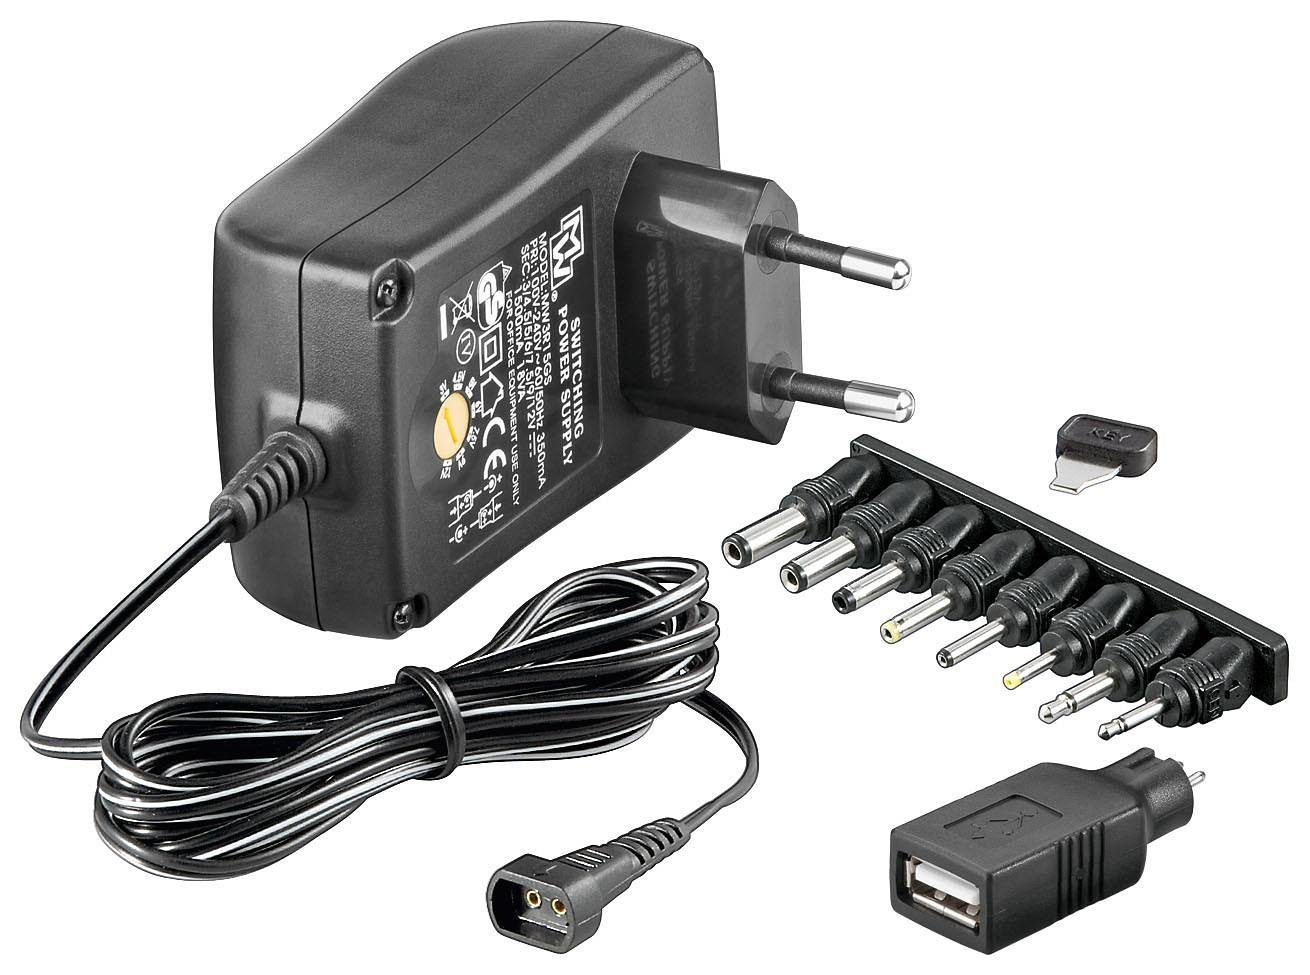 goobay 3-12 V Universal-Netzteil »inkl. USB + 8 DC-Adaptern - max. 18,0 W und 1,5 A«